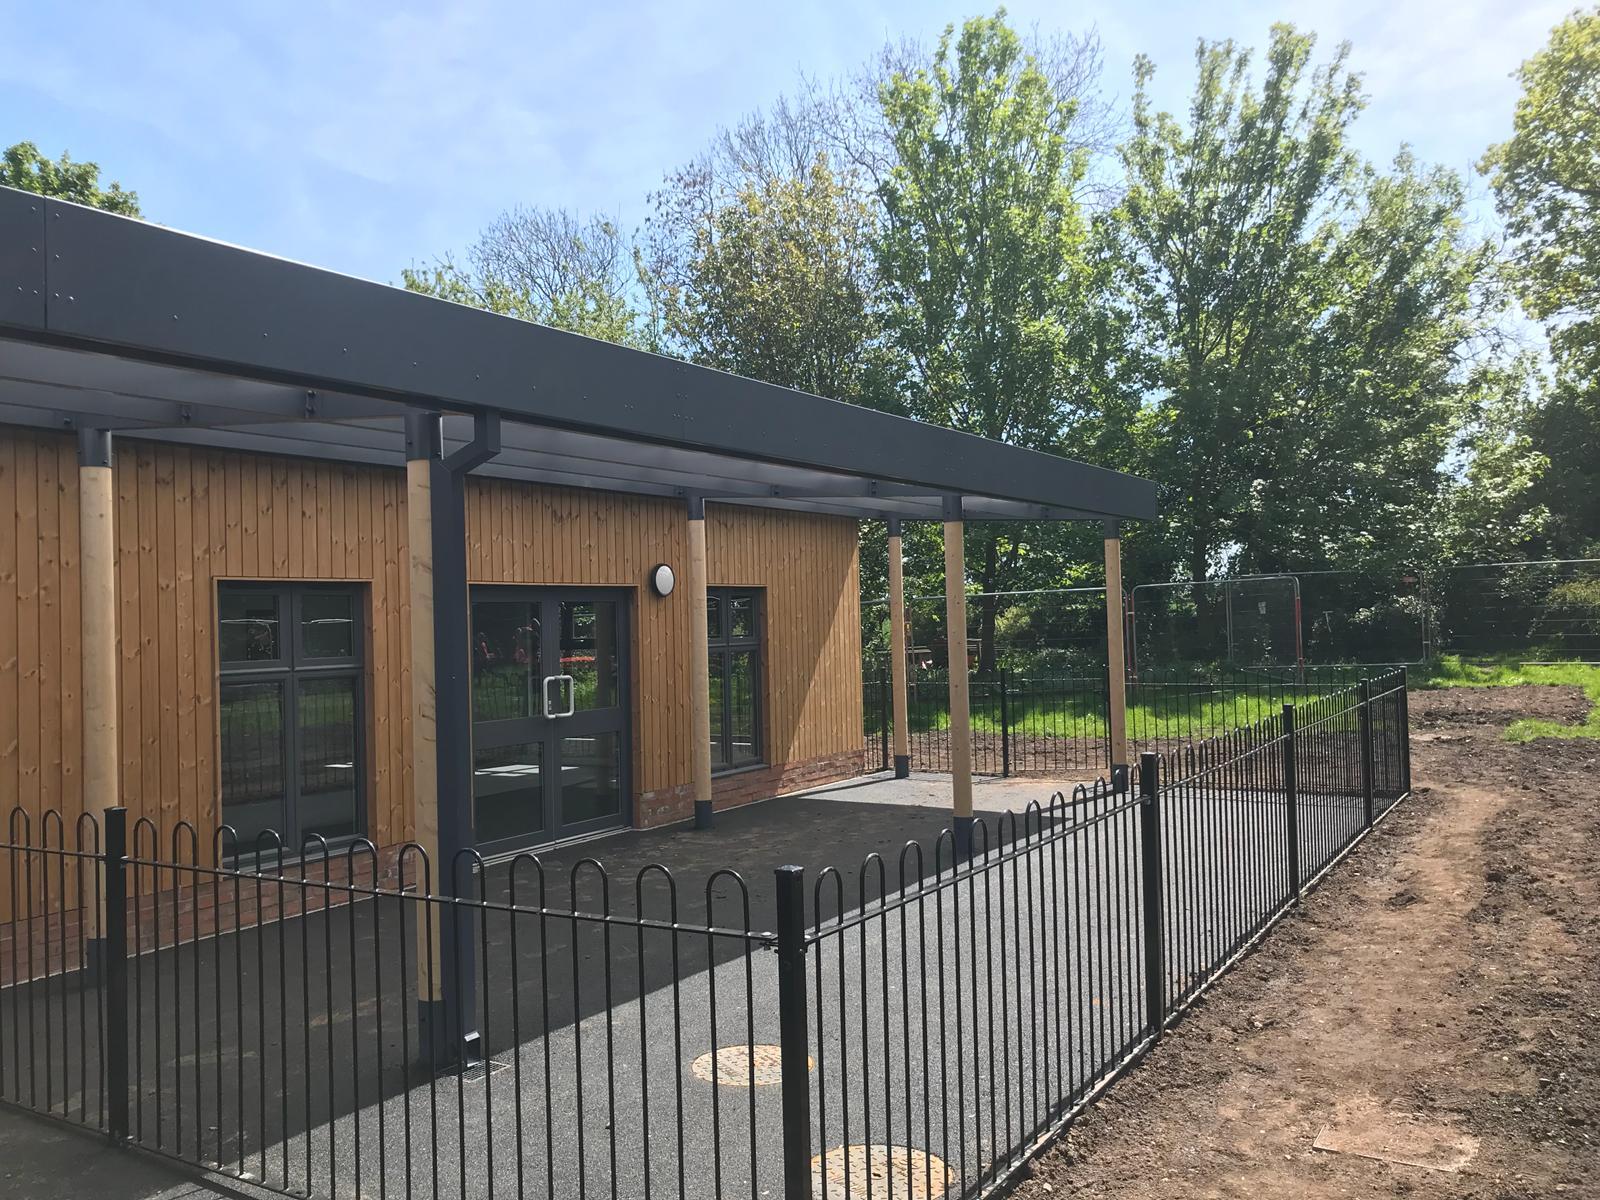 Case study - Sir John Moore's Primary School in Appleby Magna